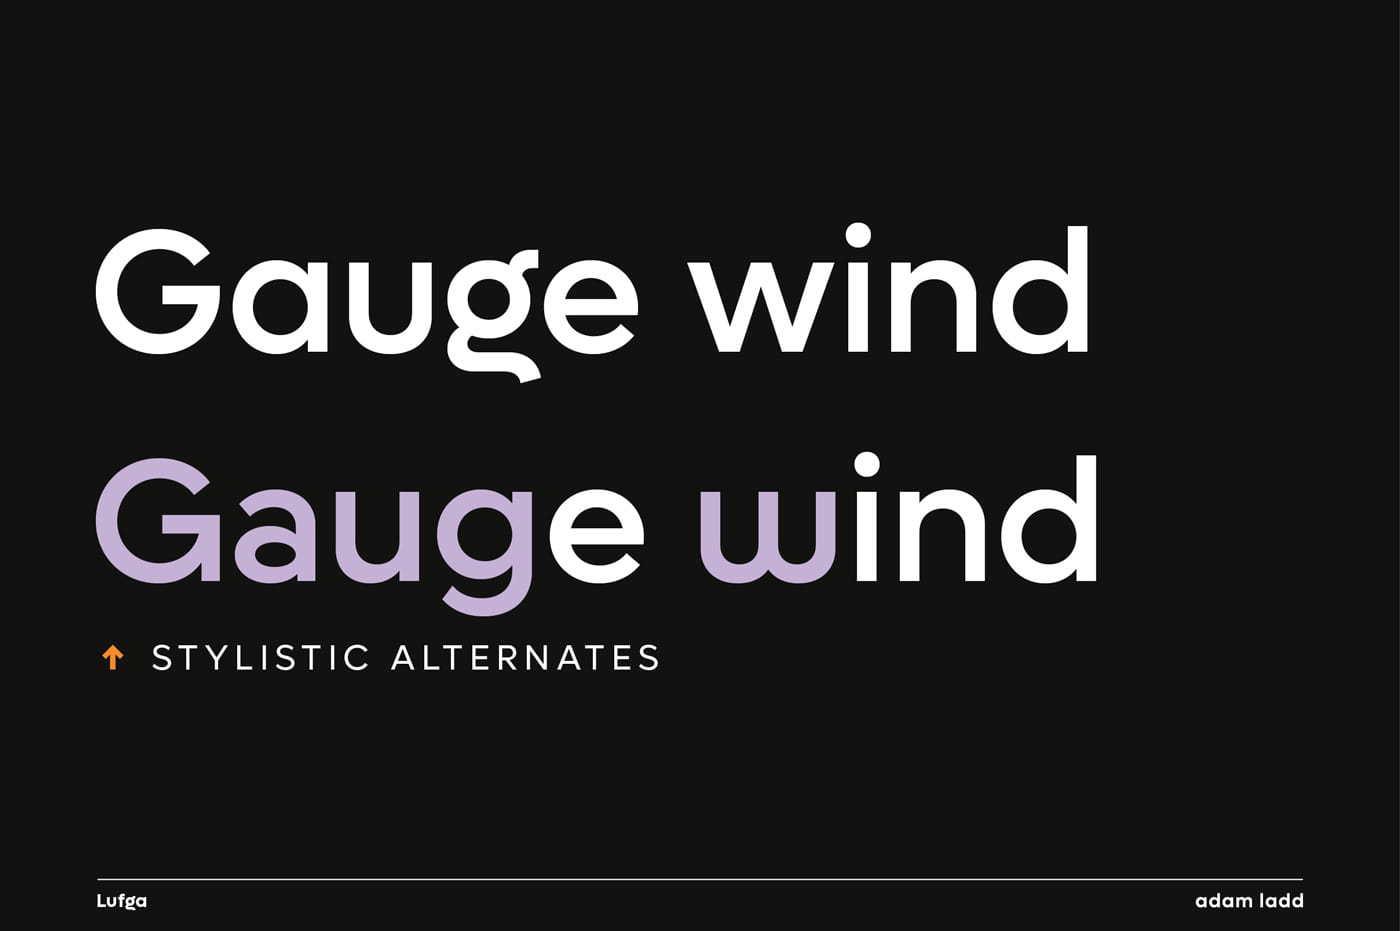 Stylistic alternates (G, a, g, u, w)